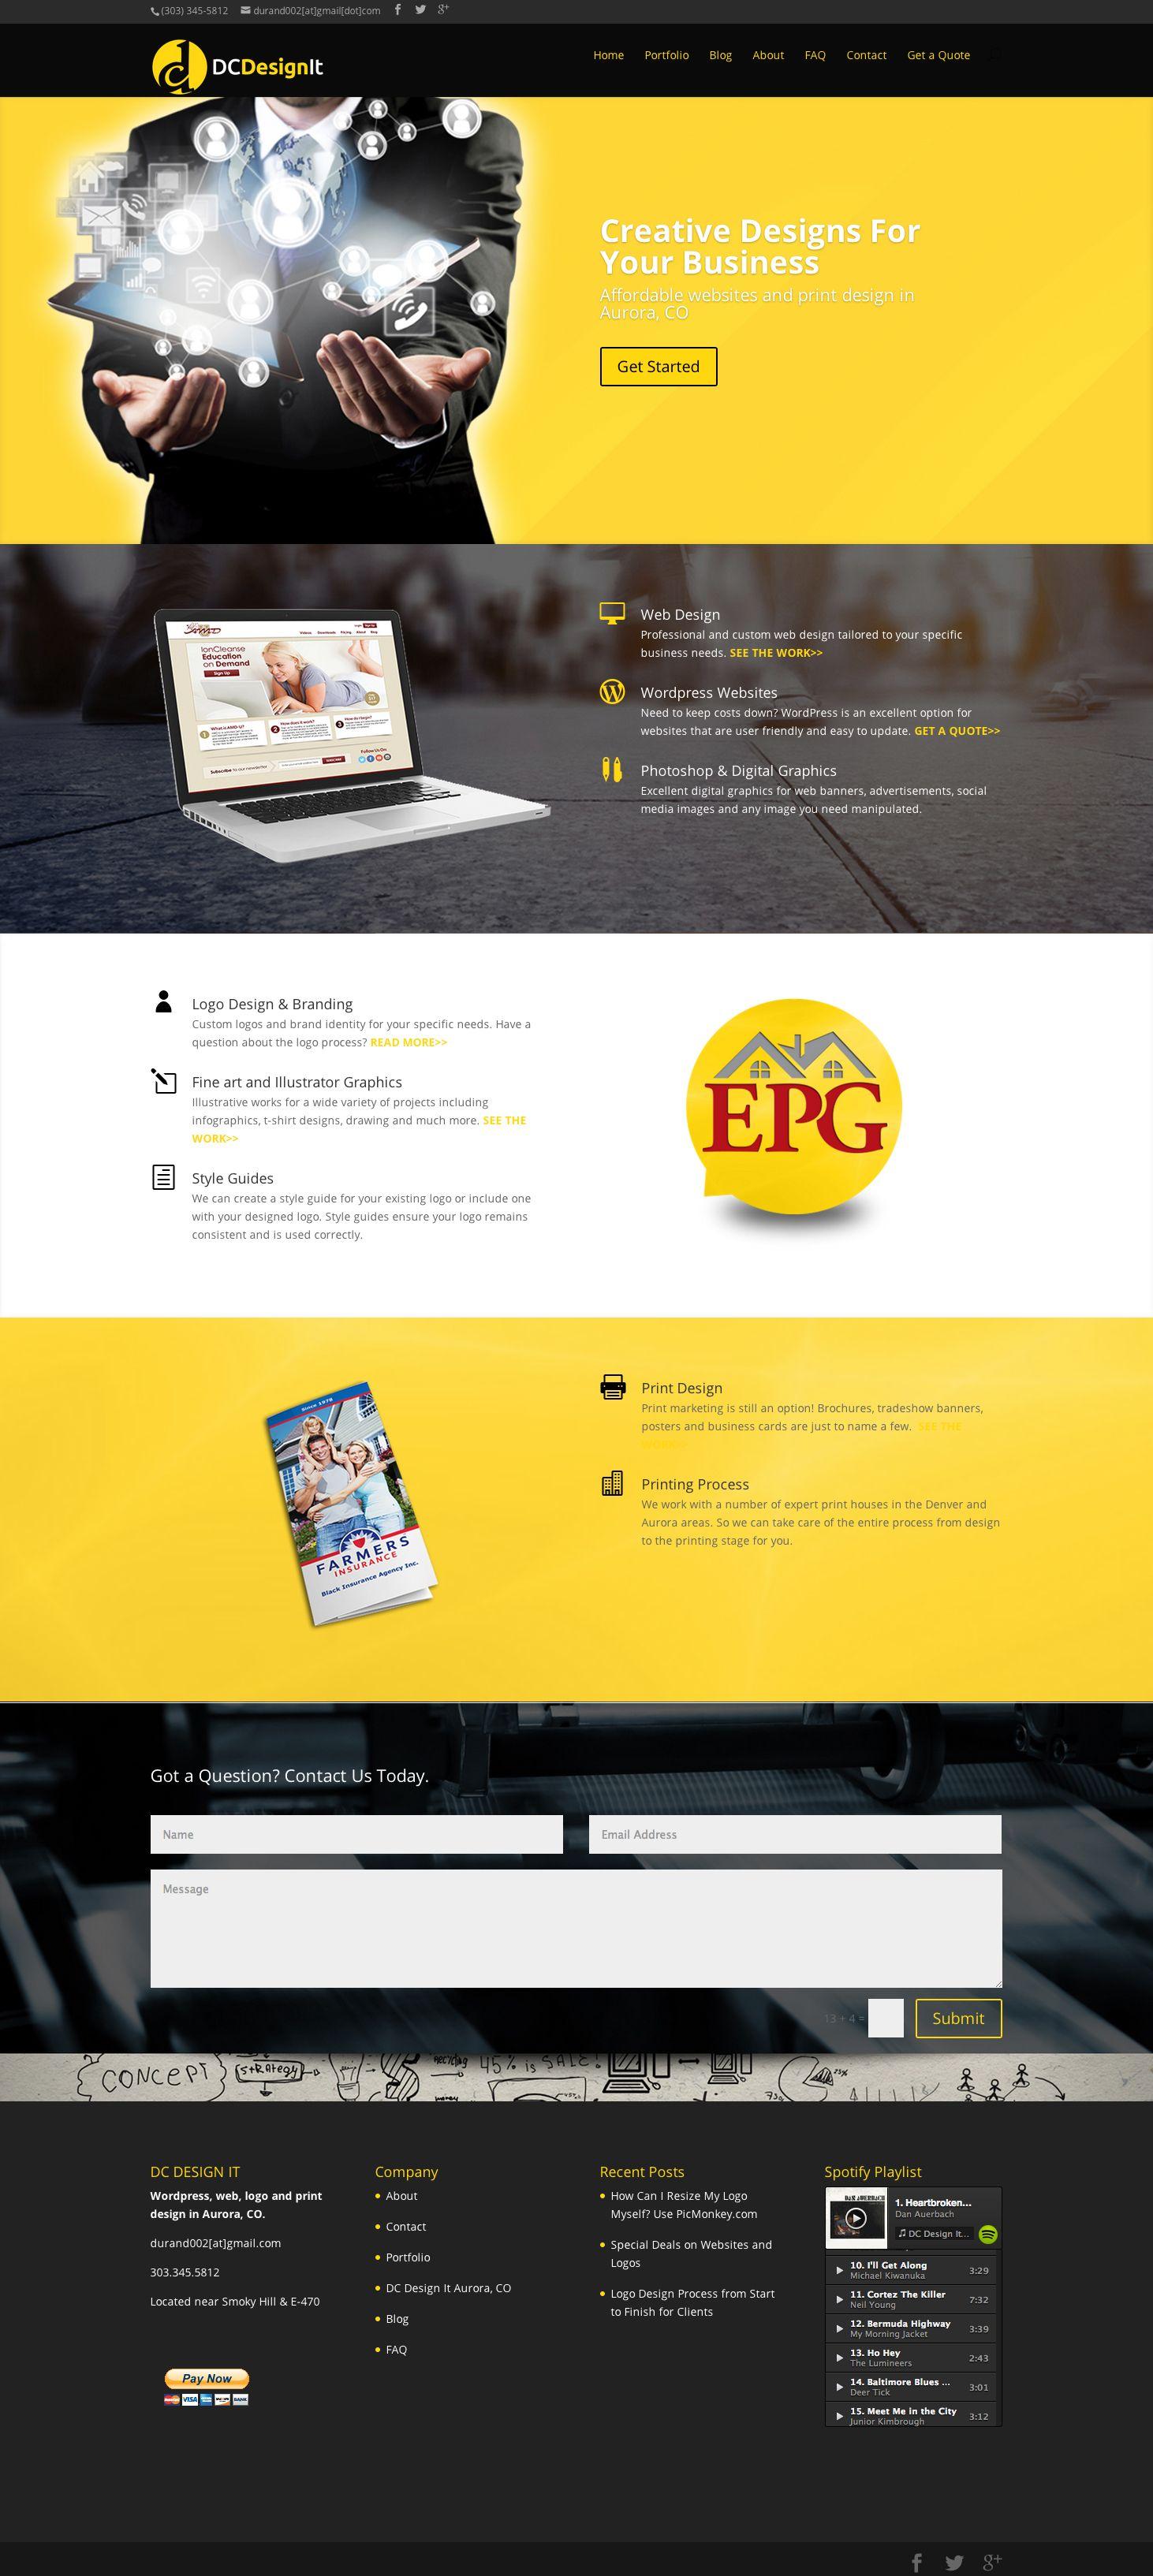 Dc Design It Website Web And Print Design Aurora Graphic Design Black Yellow Website Dcdesignit Com Website Design Web Design Design